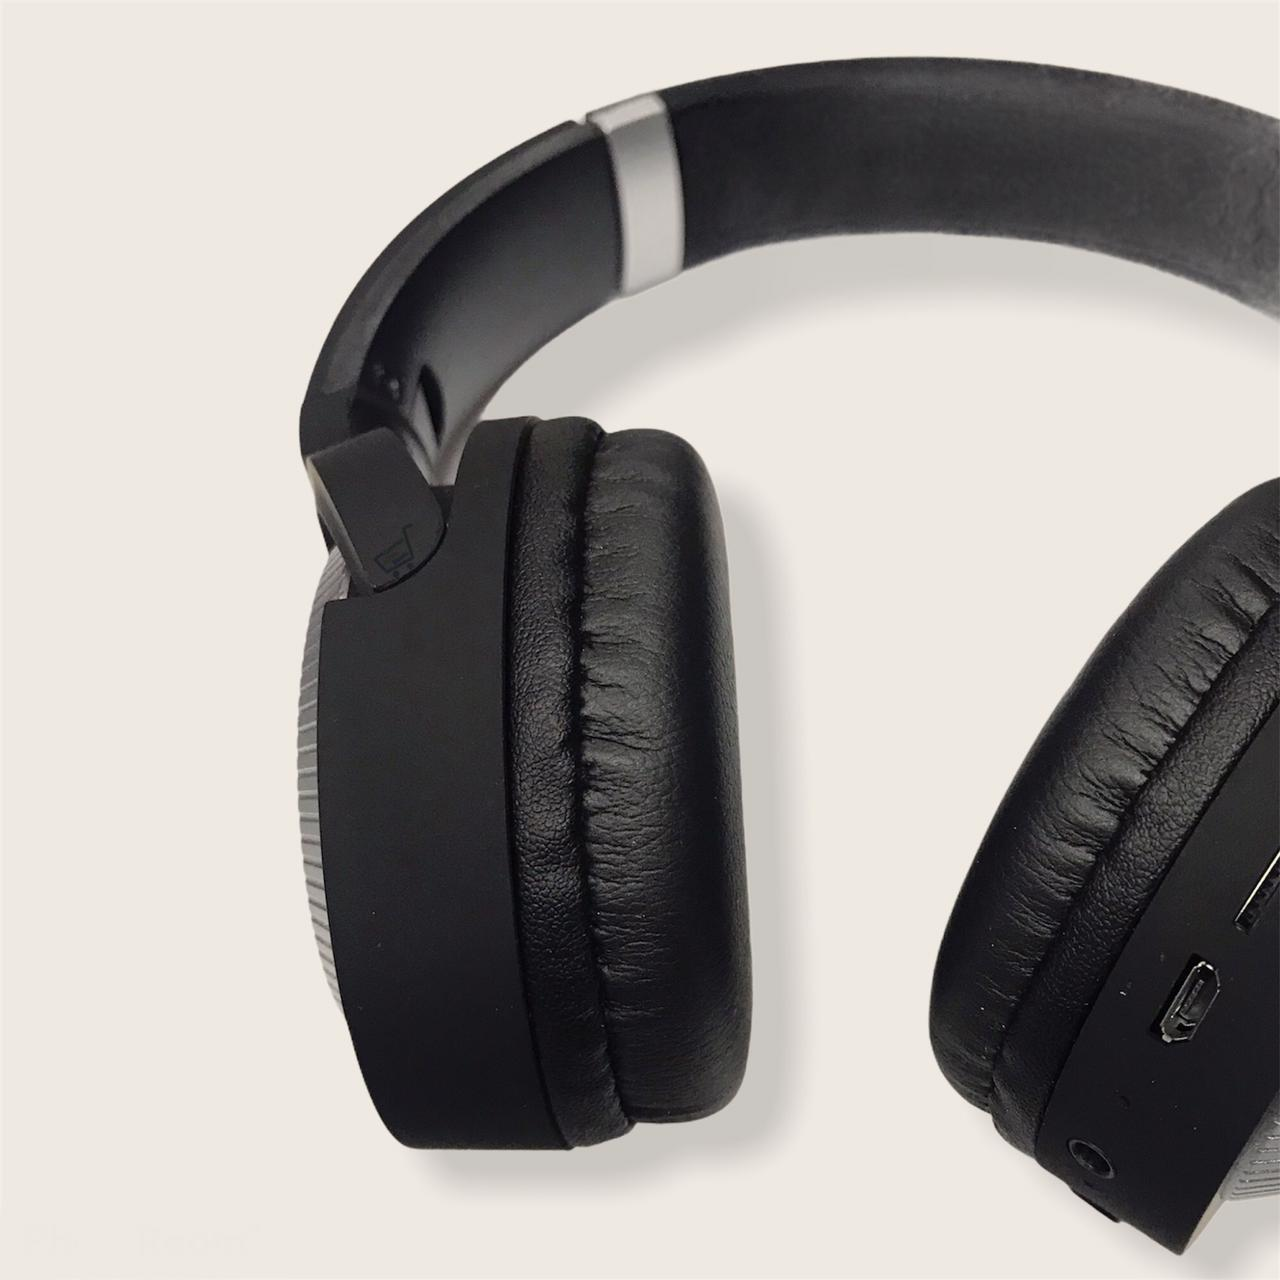 Fone De Ouvido Headphone Pro 20 Xiaomi Bluetooth